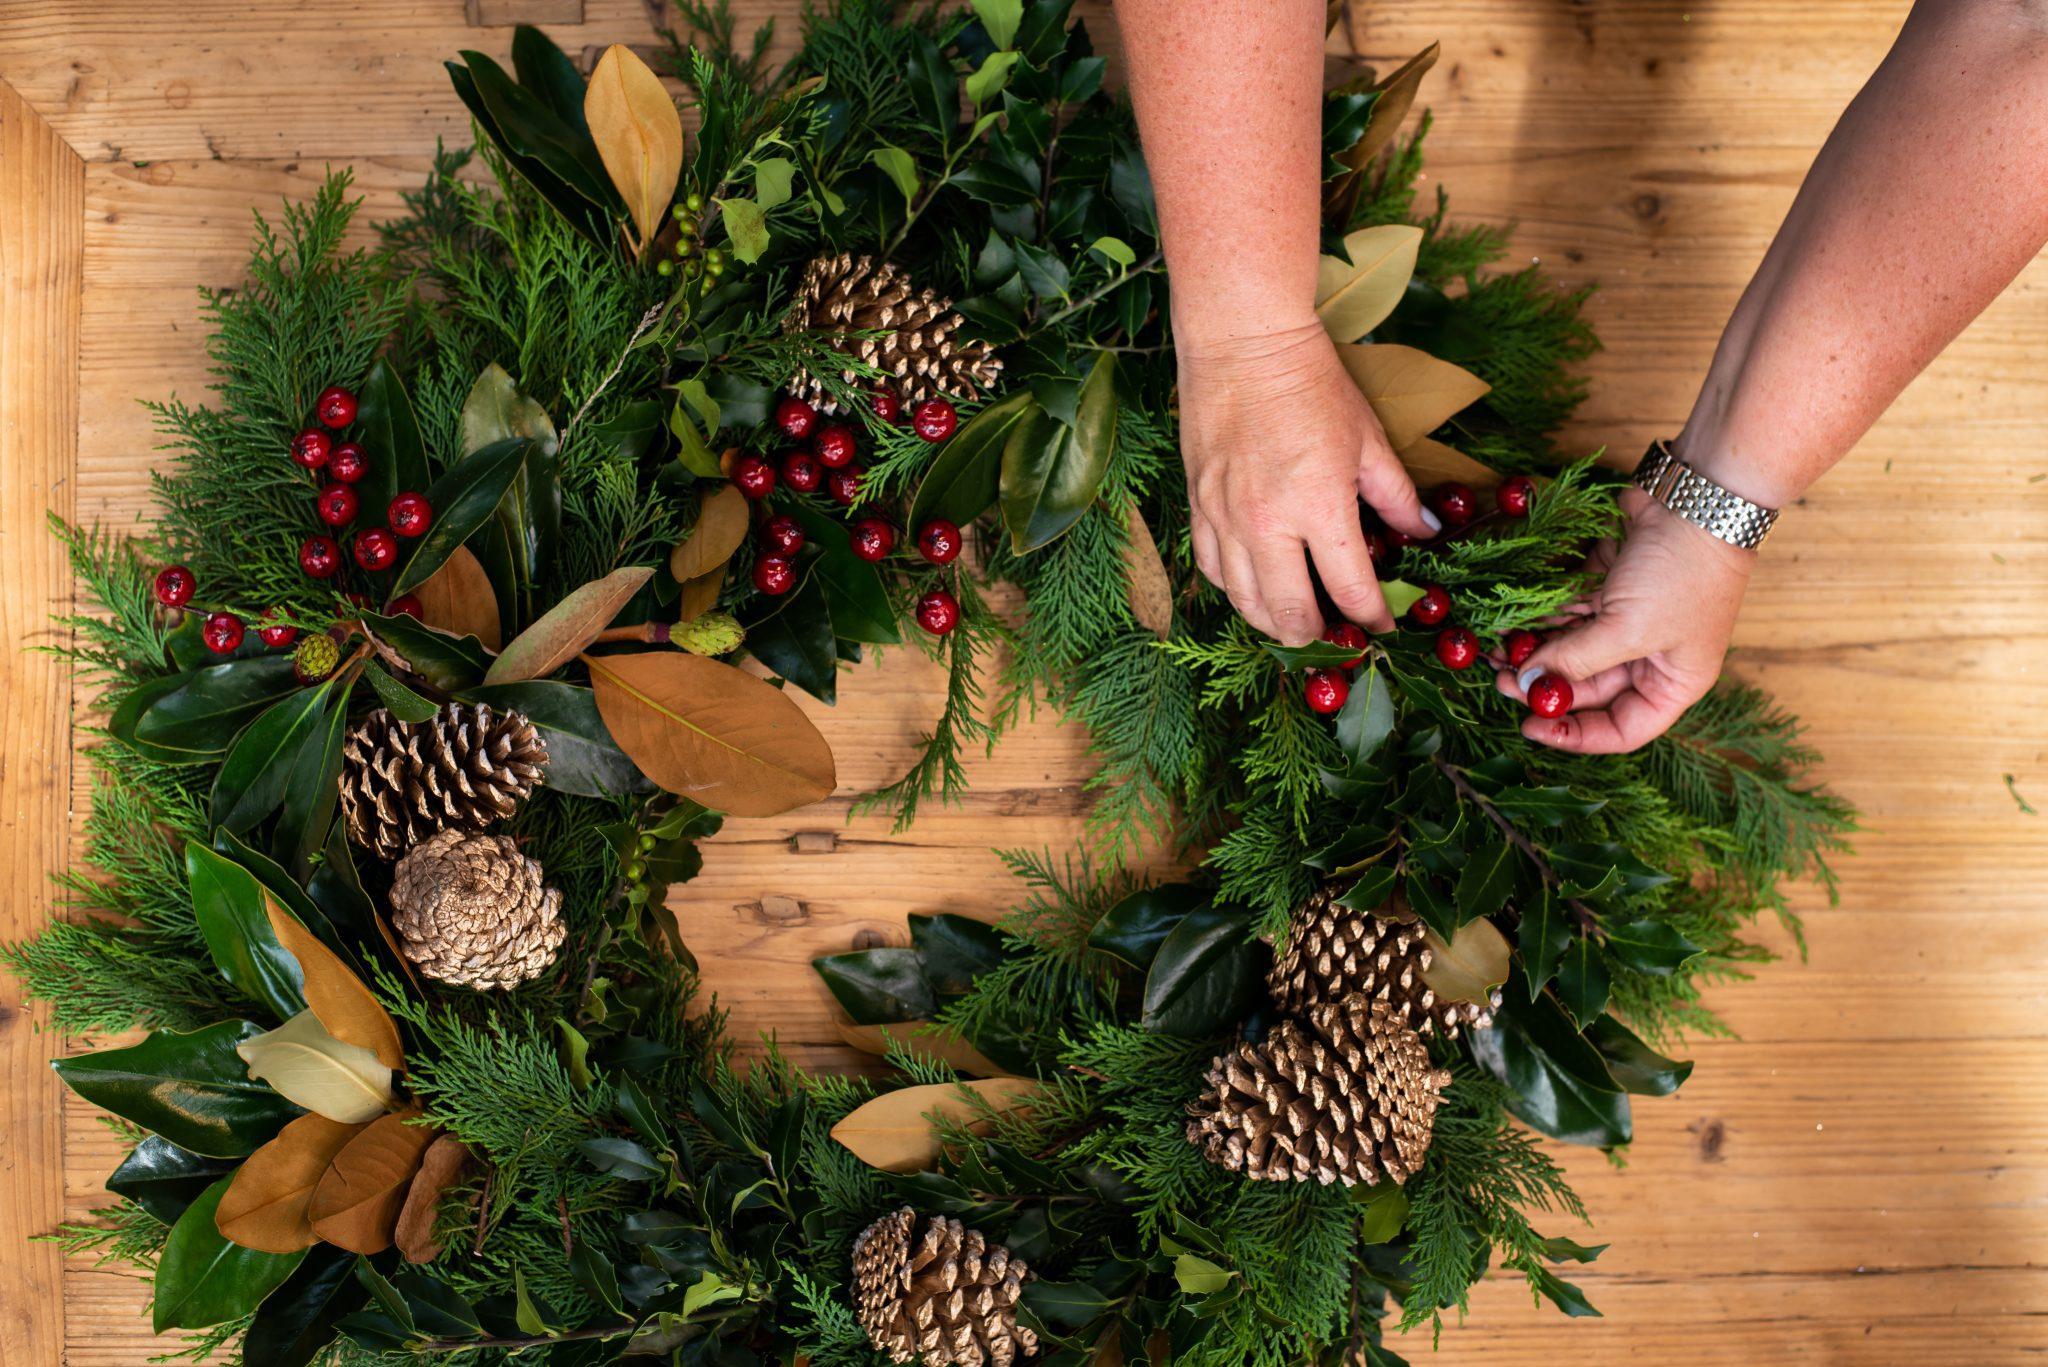 Wreath-making Workshops - Saturday 4th December